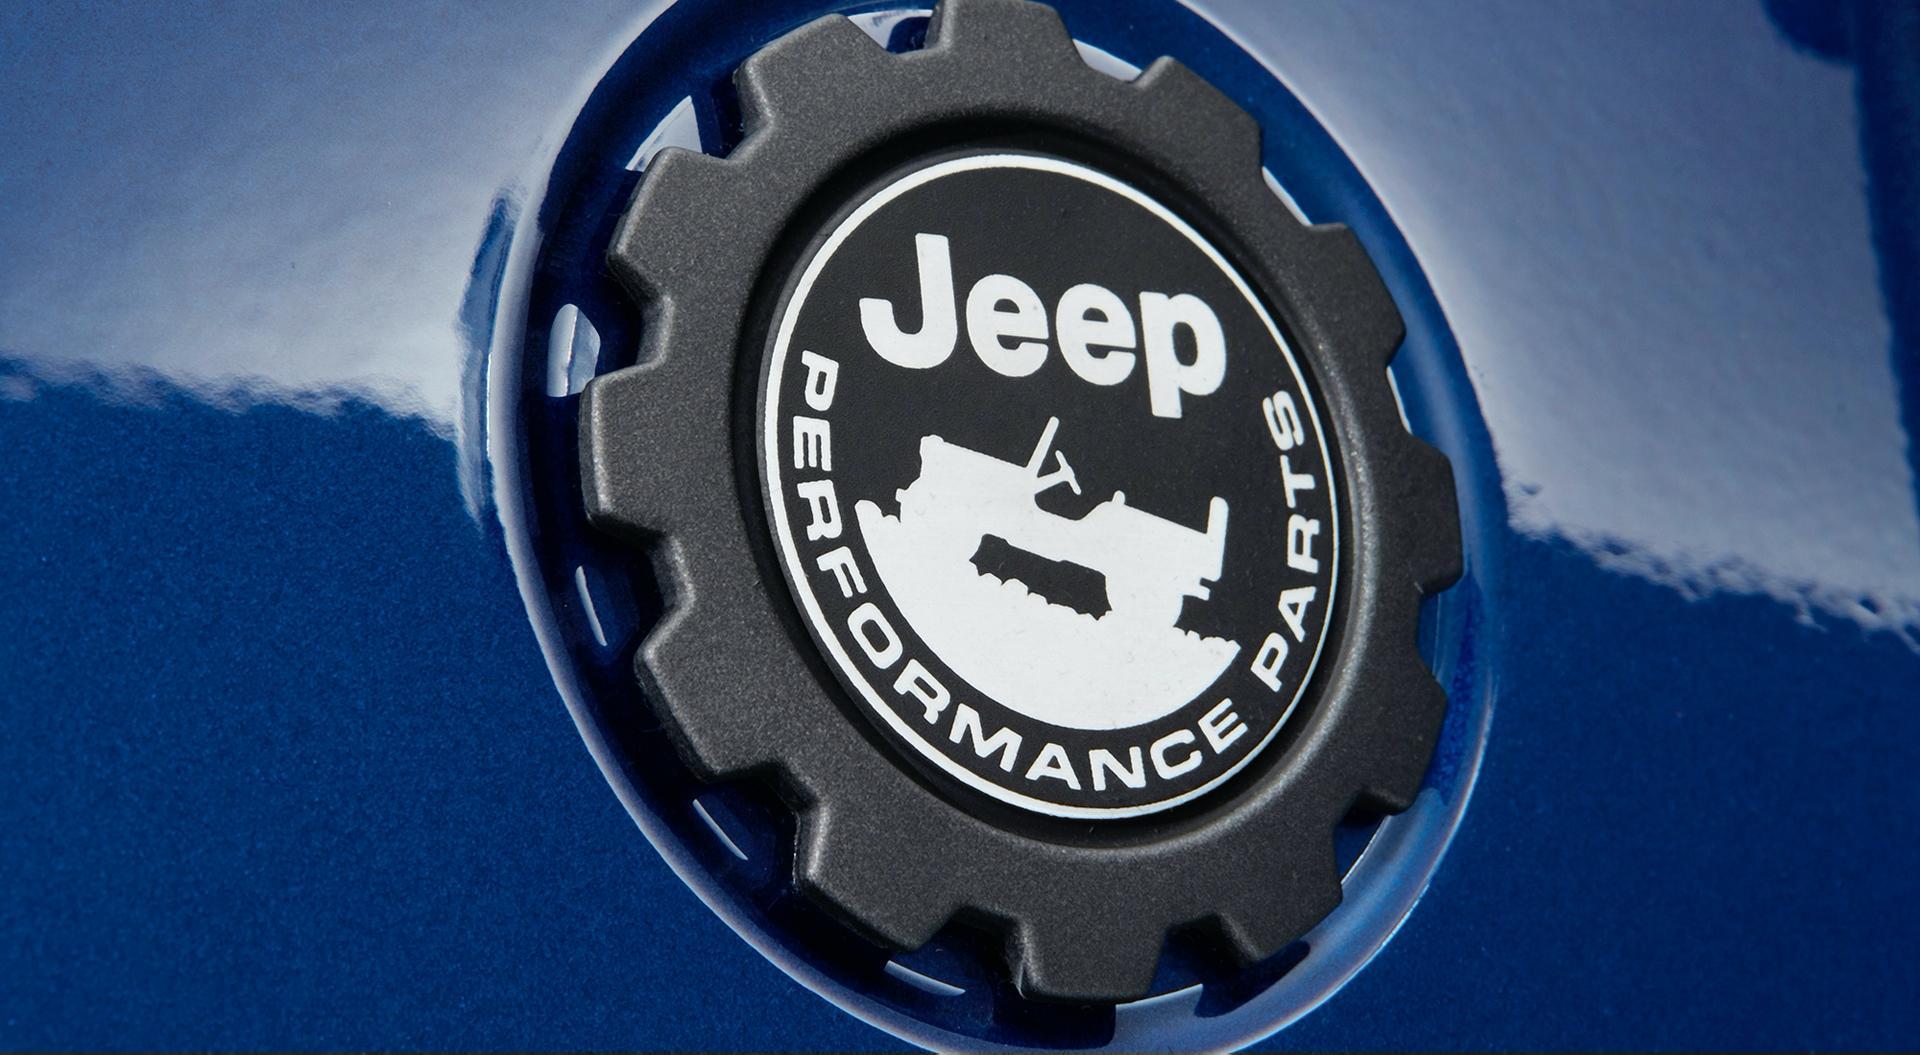 Jeep-Wrangler-JPP-20-Limited-Edition-9